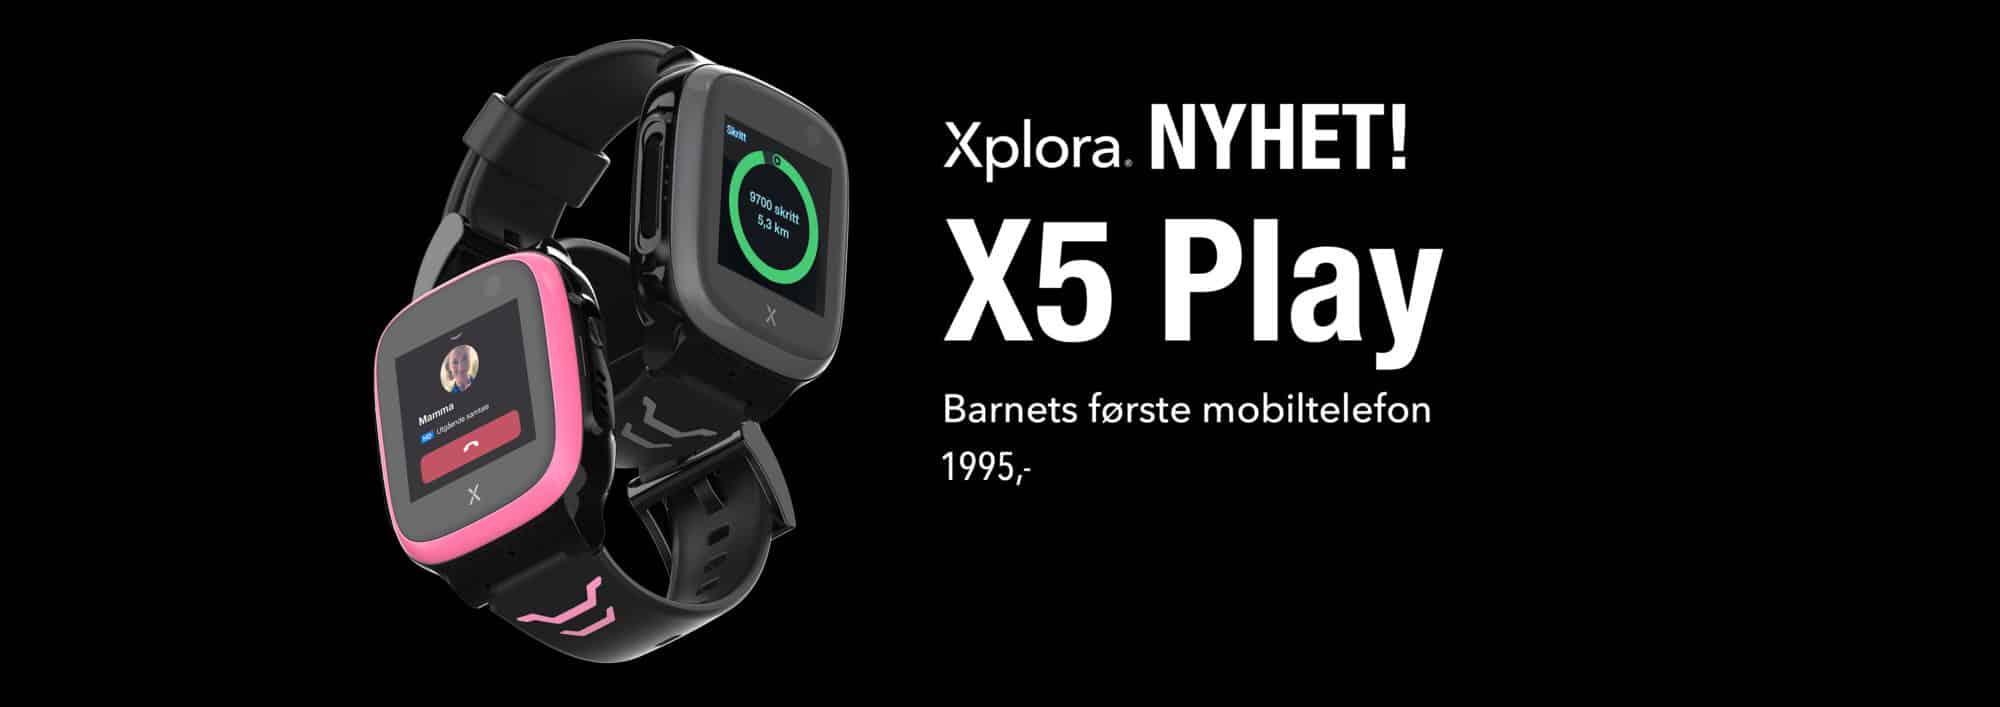 Xplora - komplett mobiltelefon